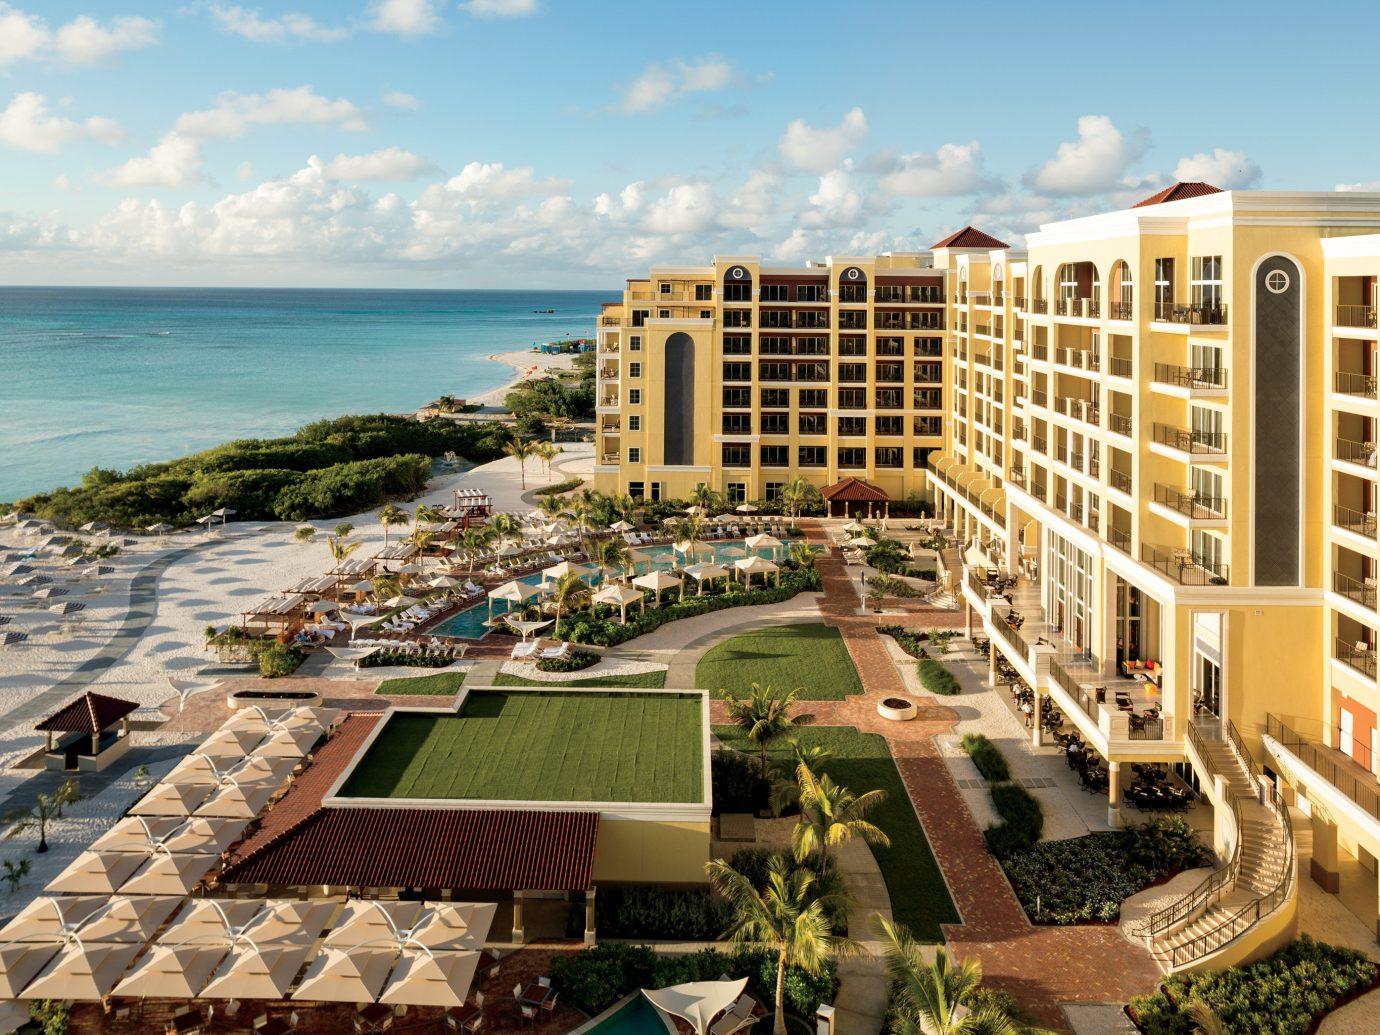 Ritz-Carlton Aruba